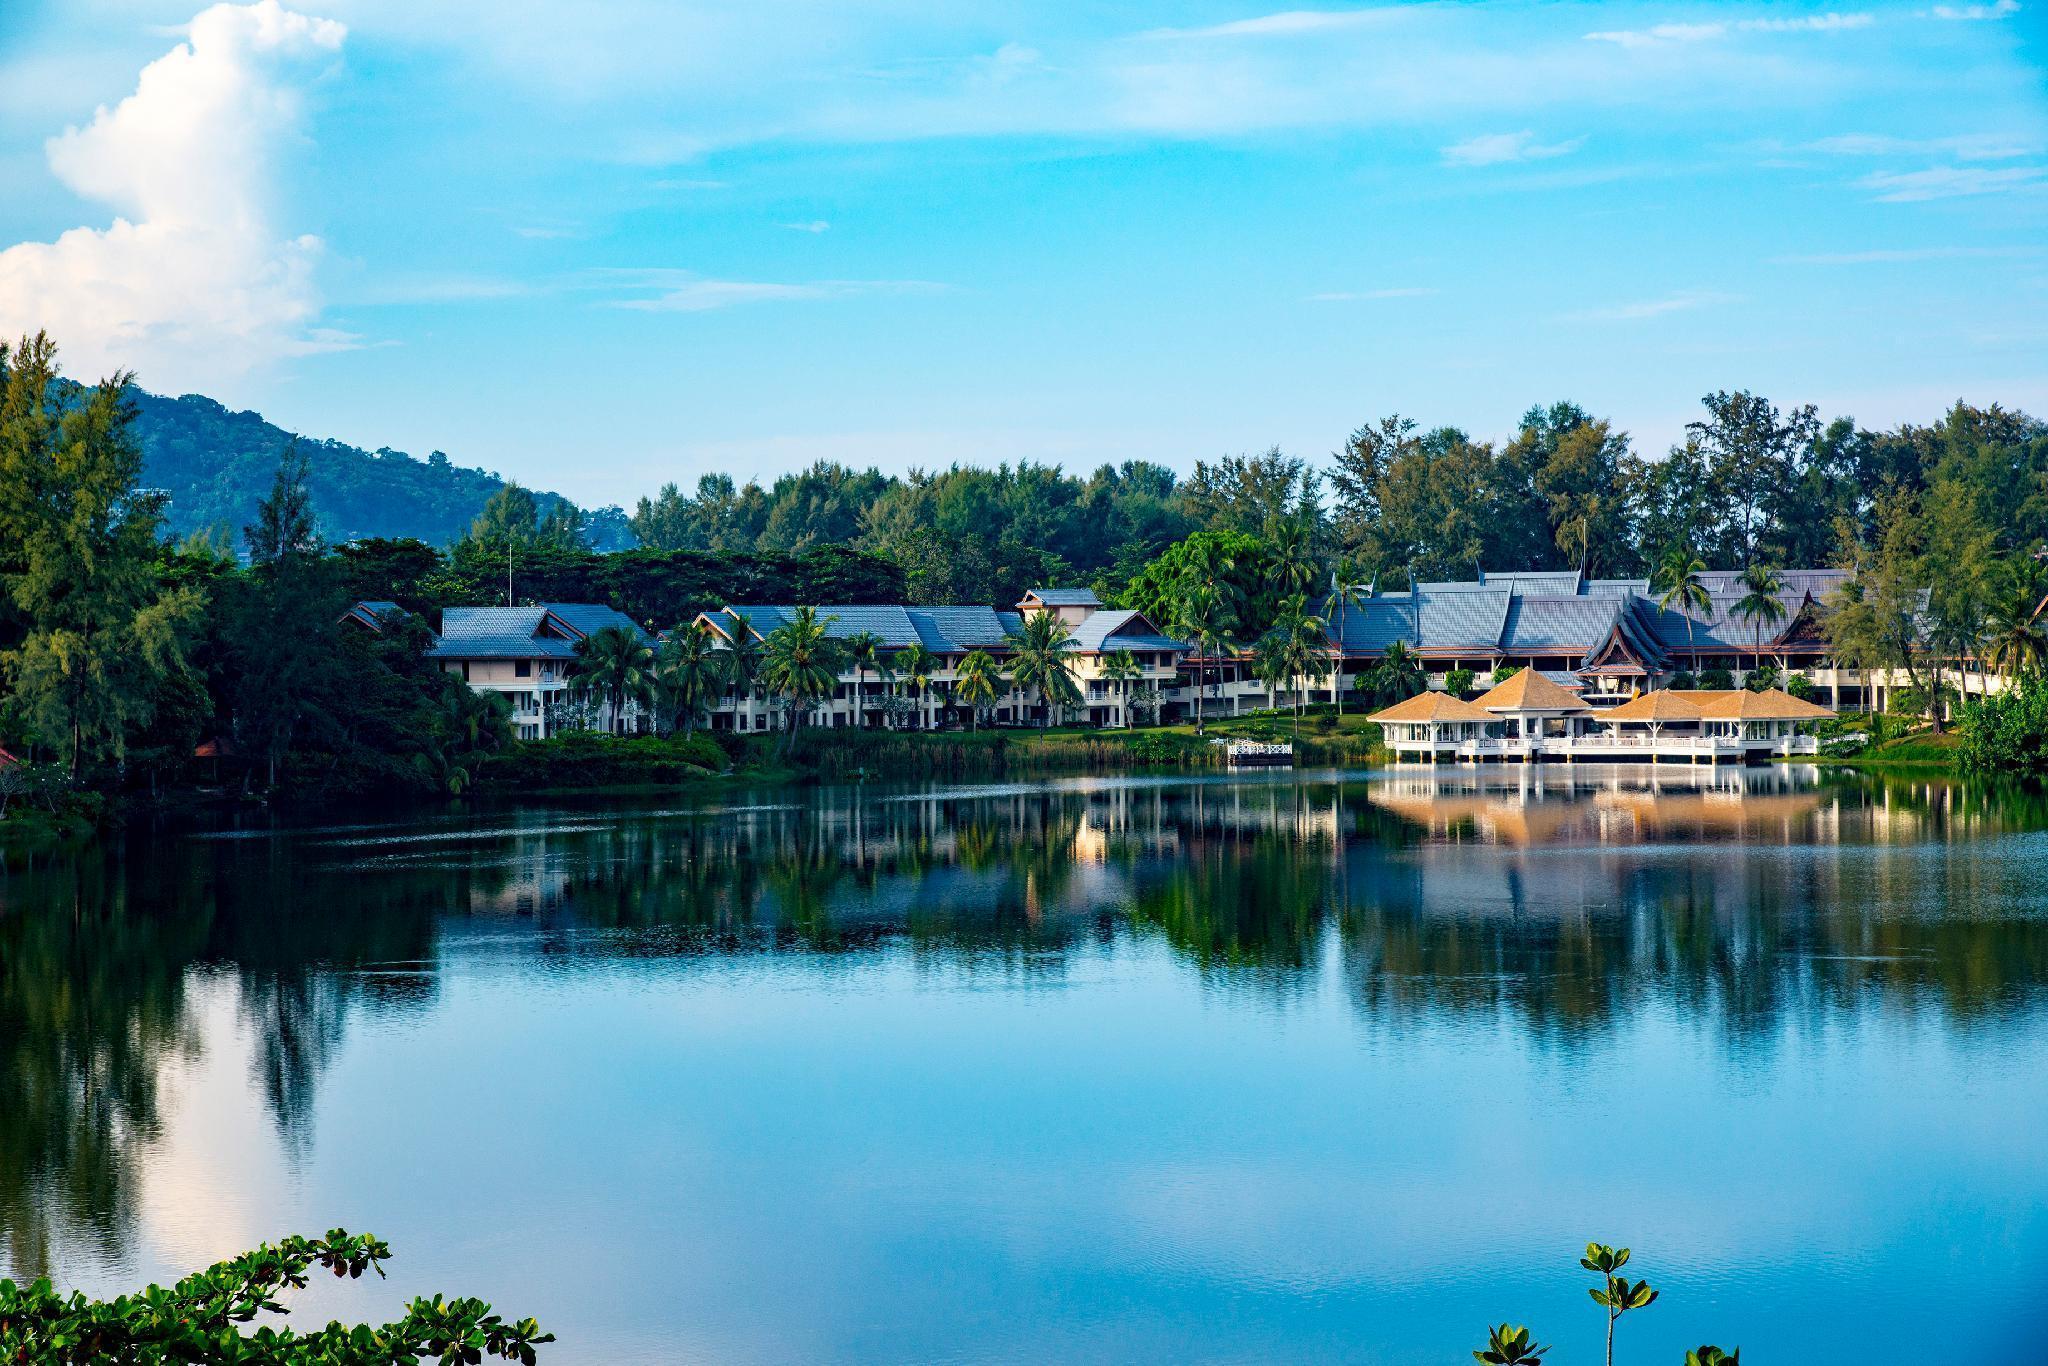 Laguna townhouse 3 Bedrooms (near bangtao beach) วิลลา 3 ห้องนอน 4 ห้องน้ำส่วนตัว ขนาด 173 ตร.ม. – บางเทา